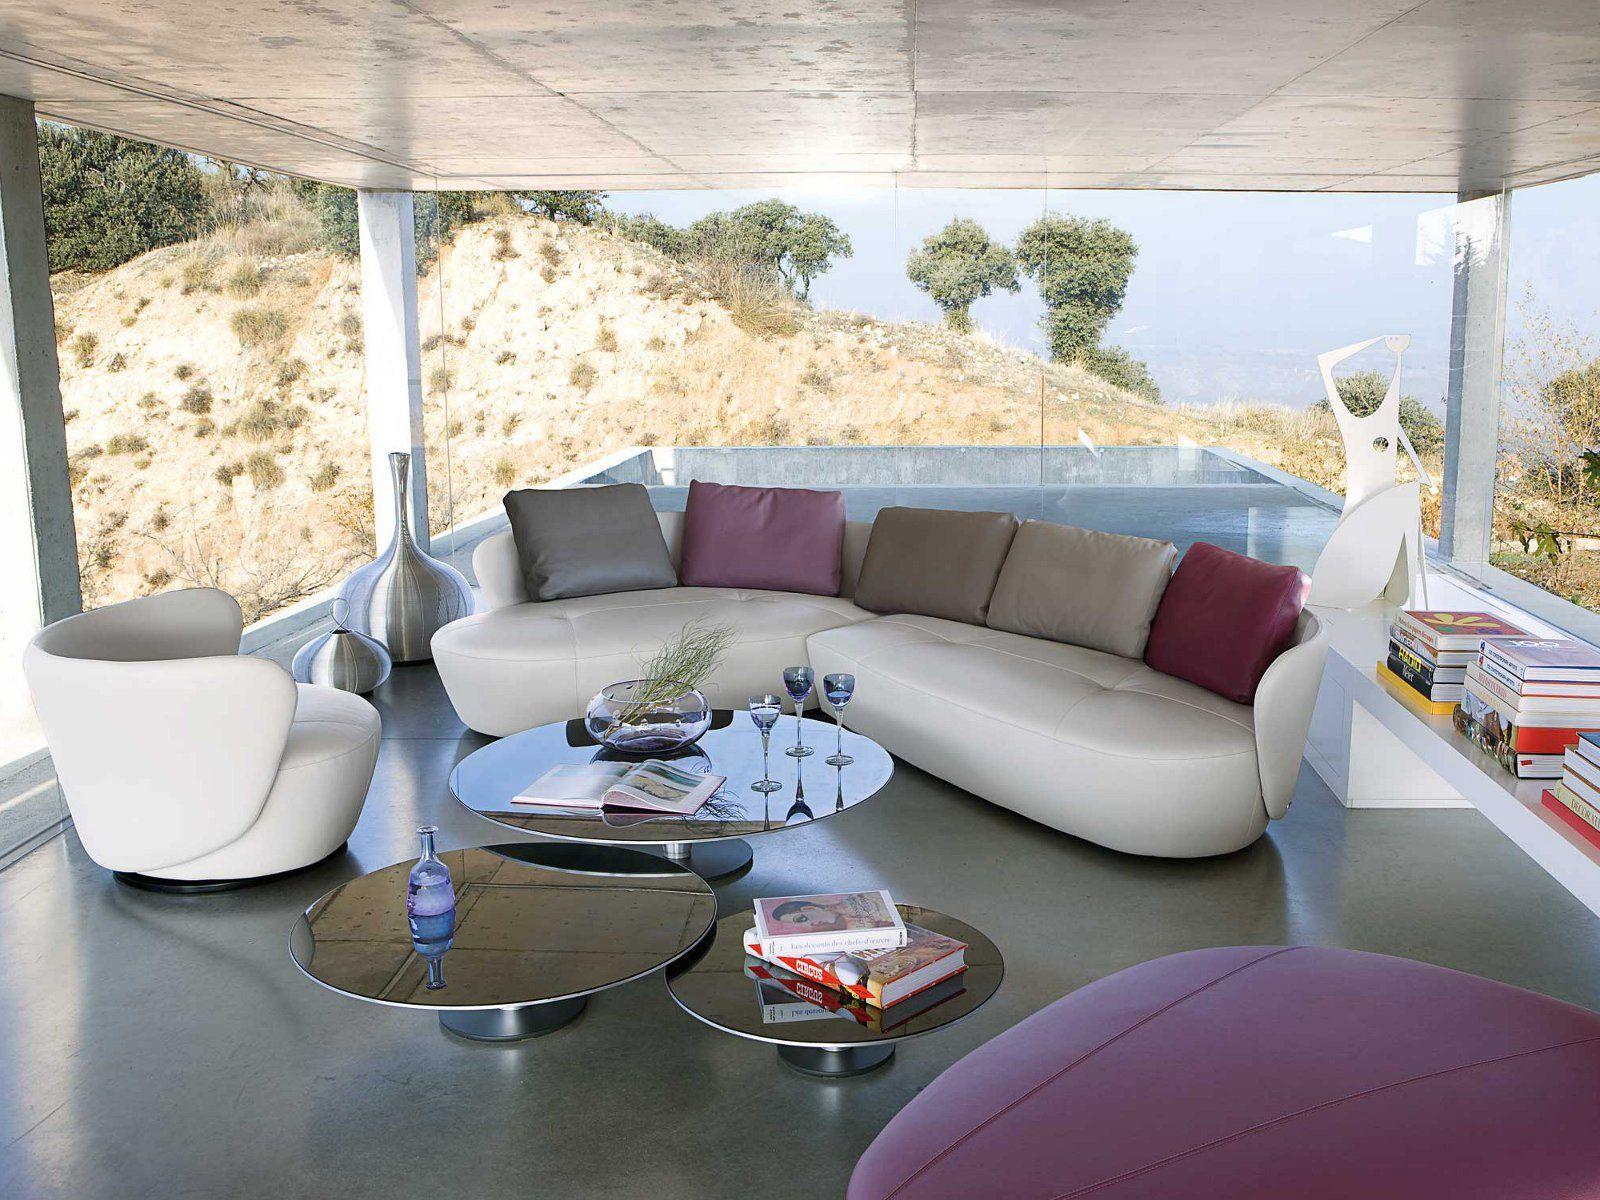 Roche Bobois Ovalis Modular Corner Sofa | Canapé Demi Lune ... concernant Canapé Rond Ou Demi Lune